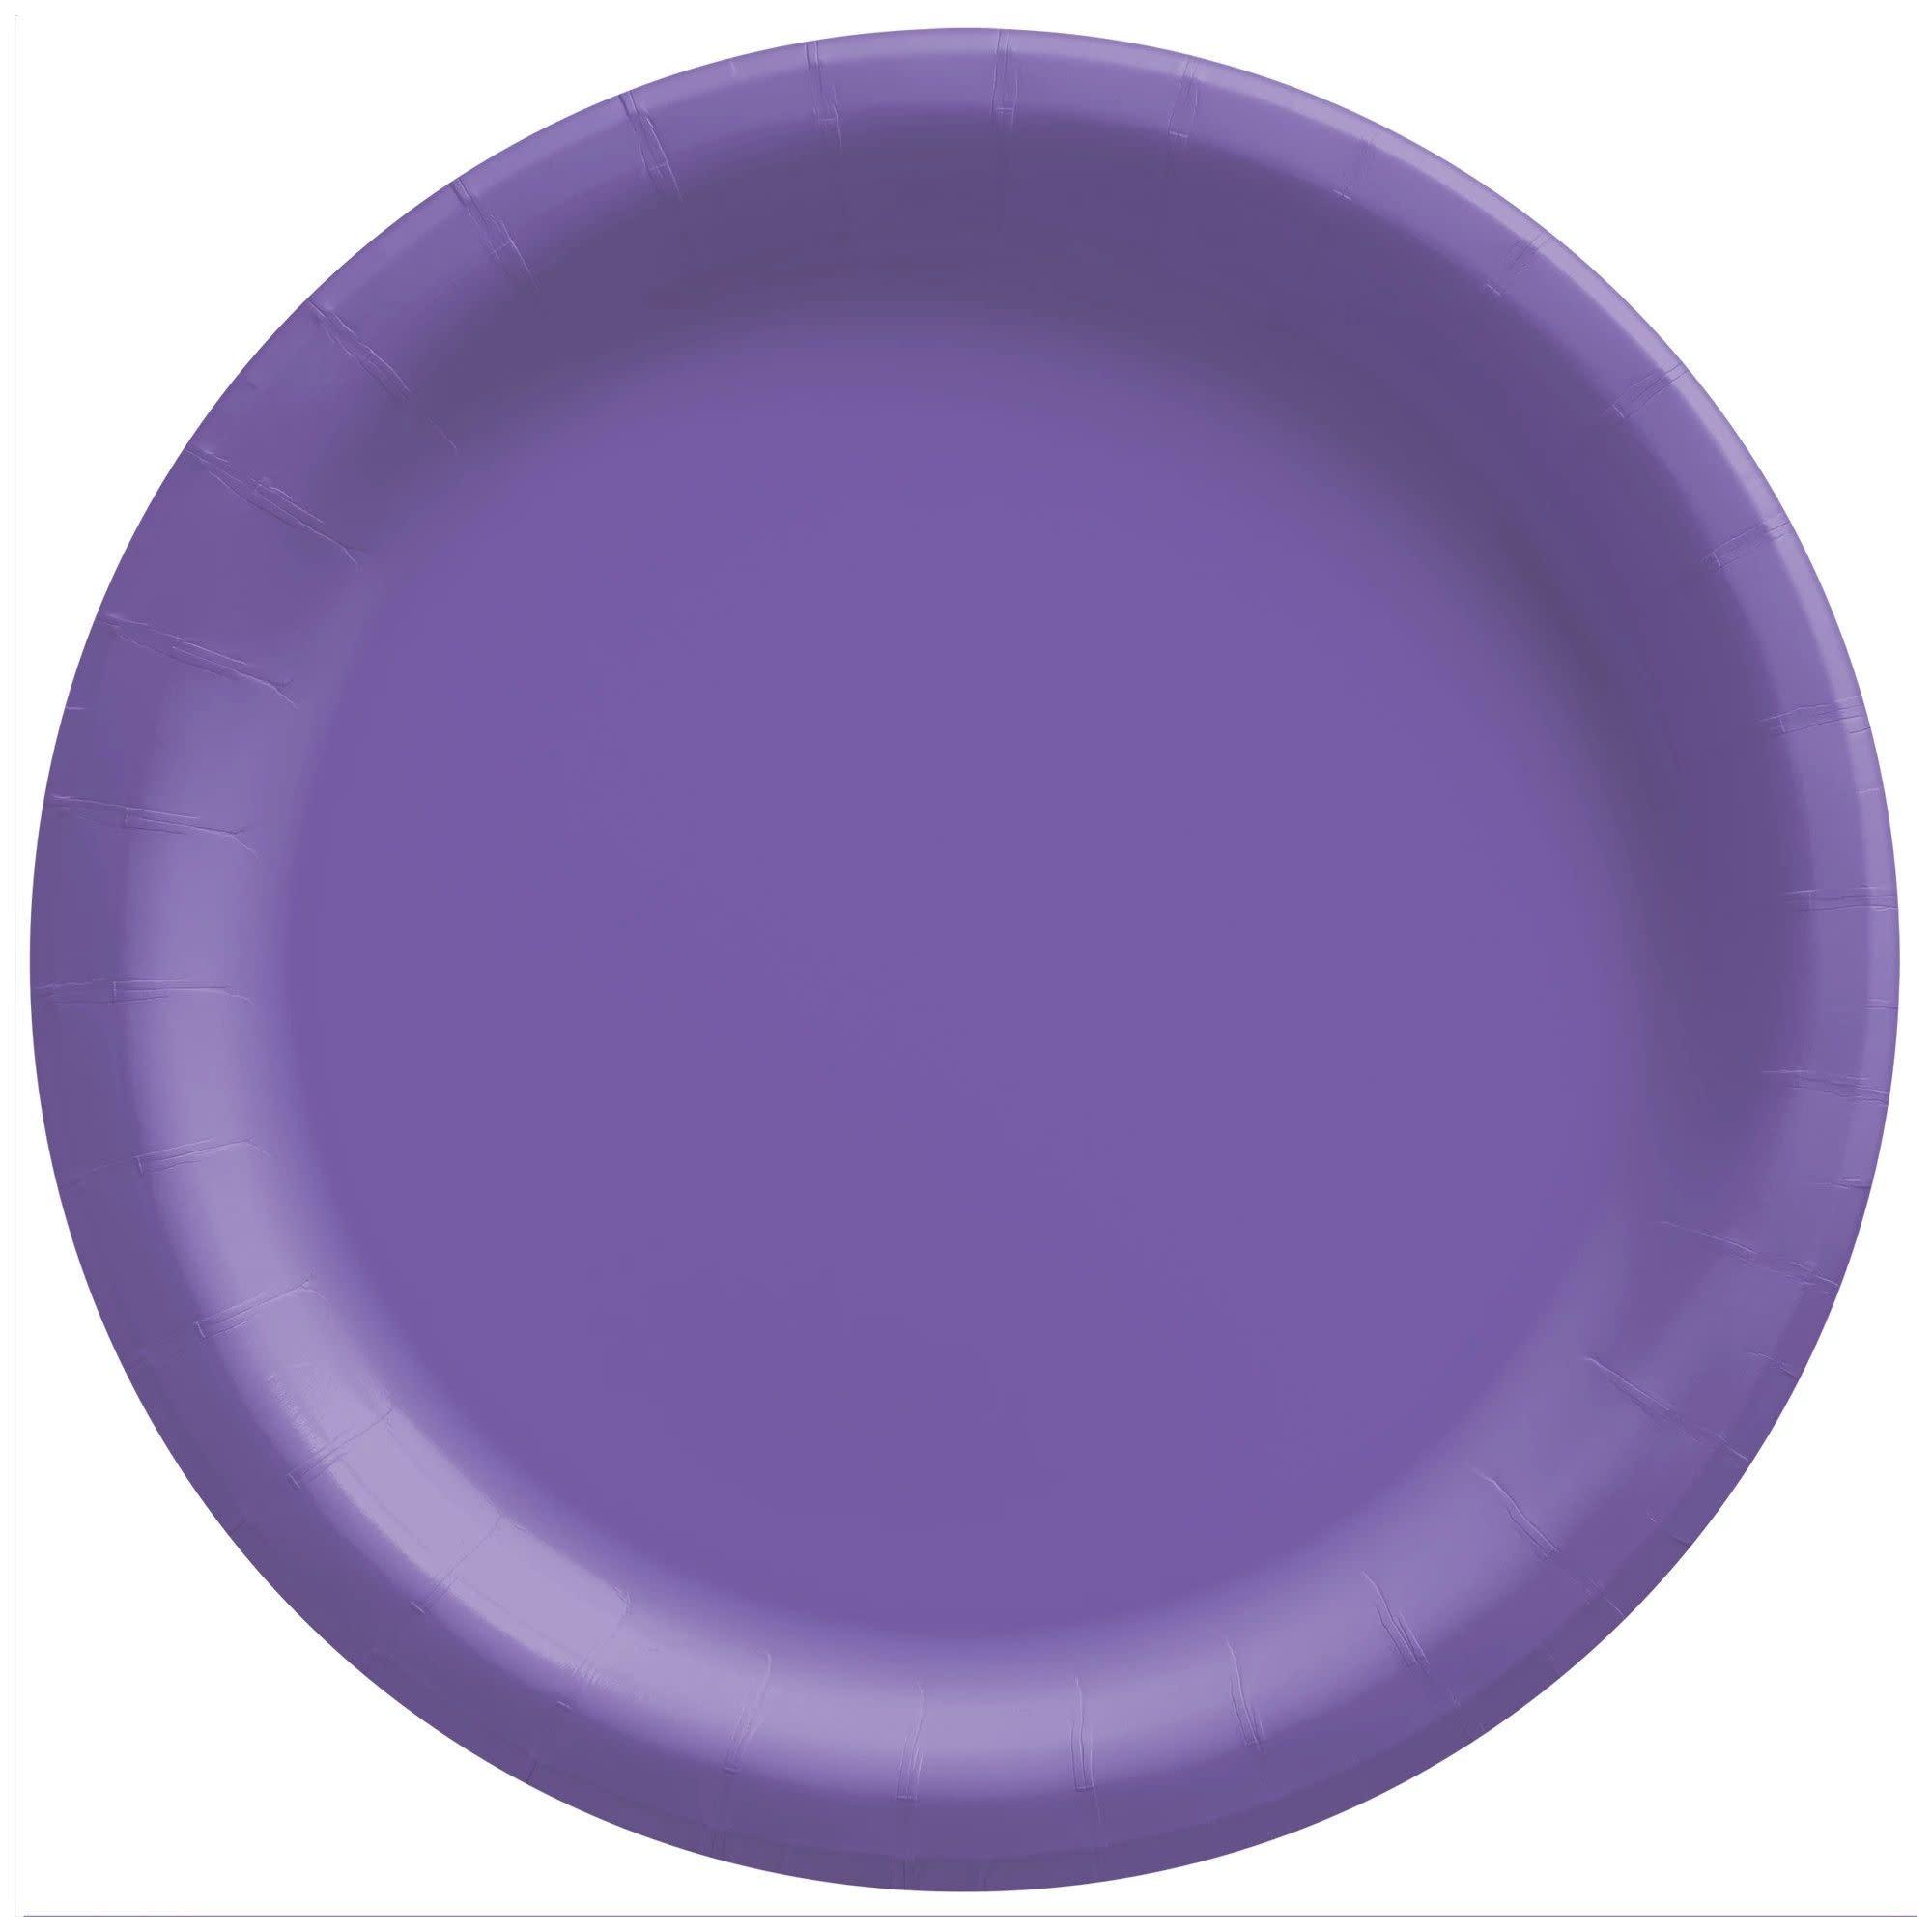 "8 1/2"" Round Paper Plates, Mid Ct. - New Purple"